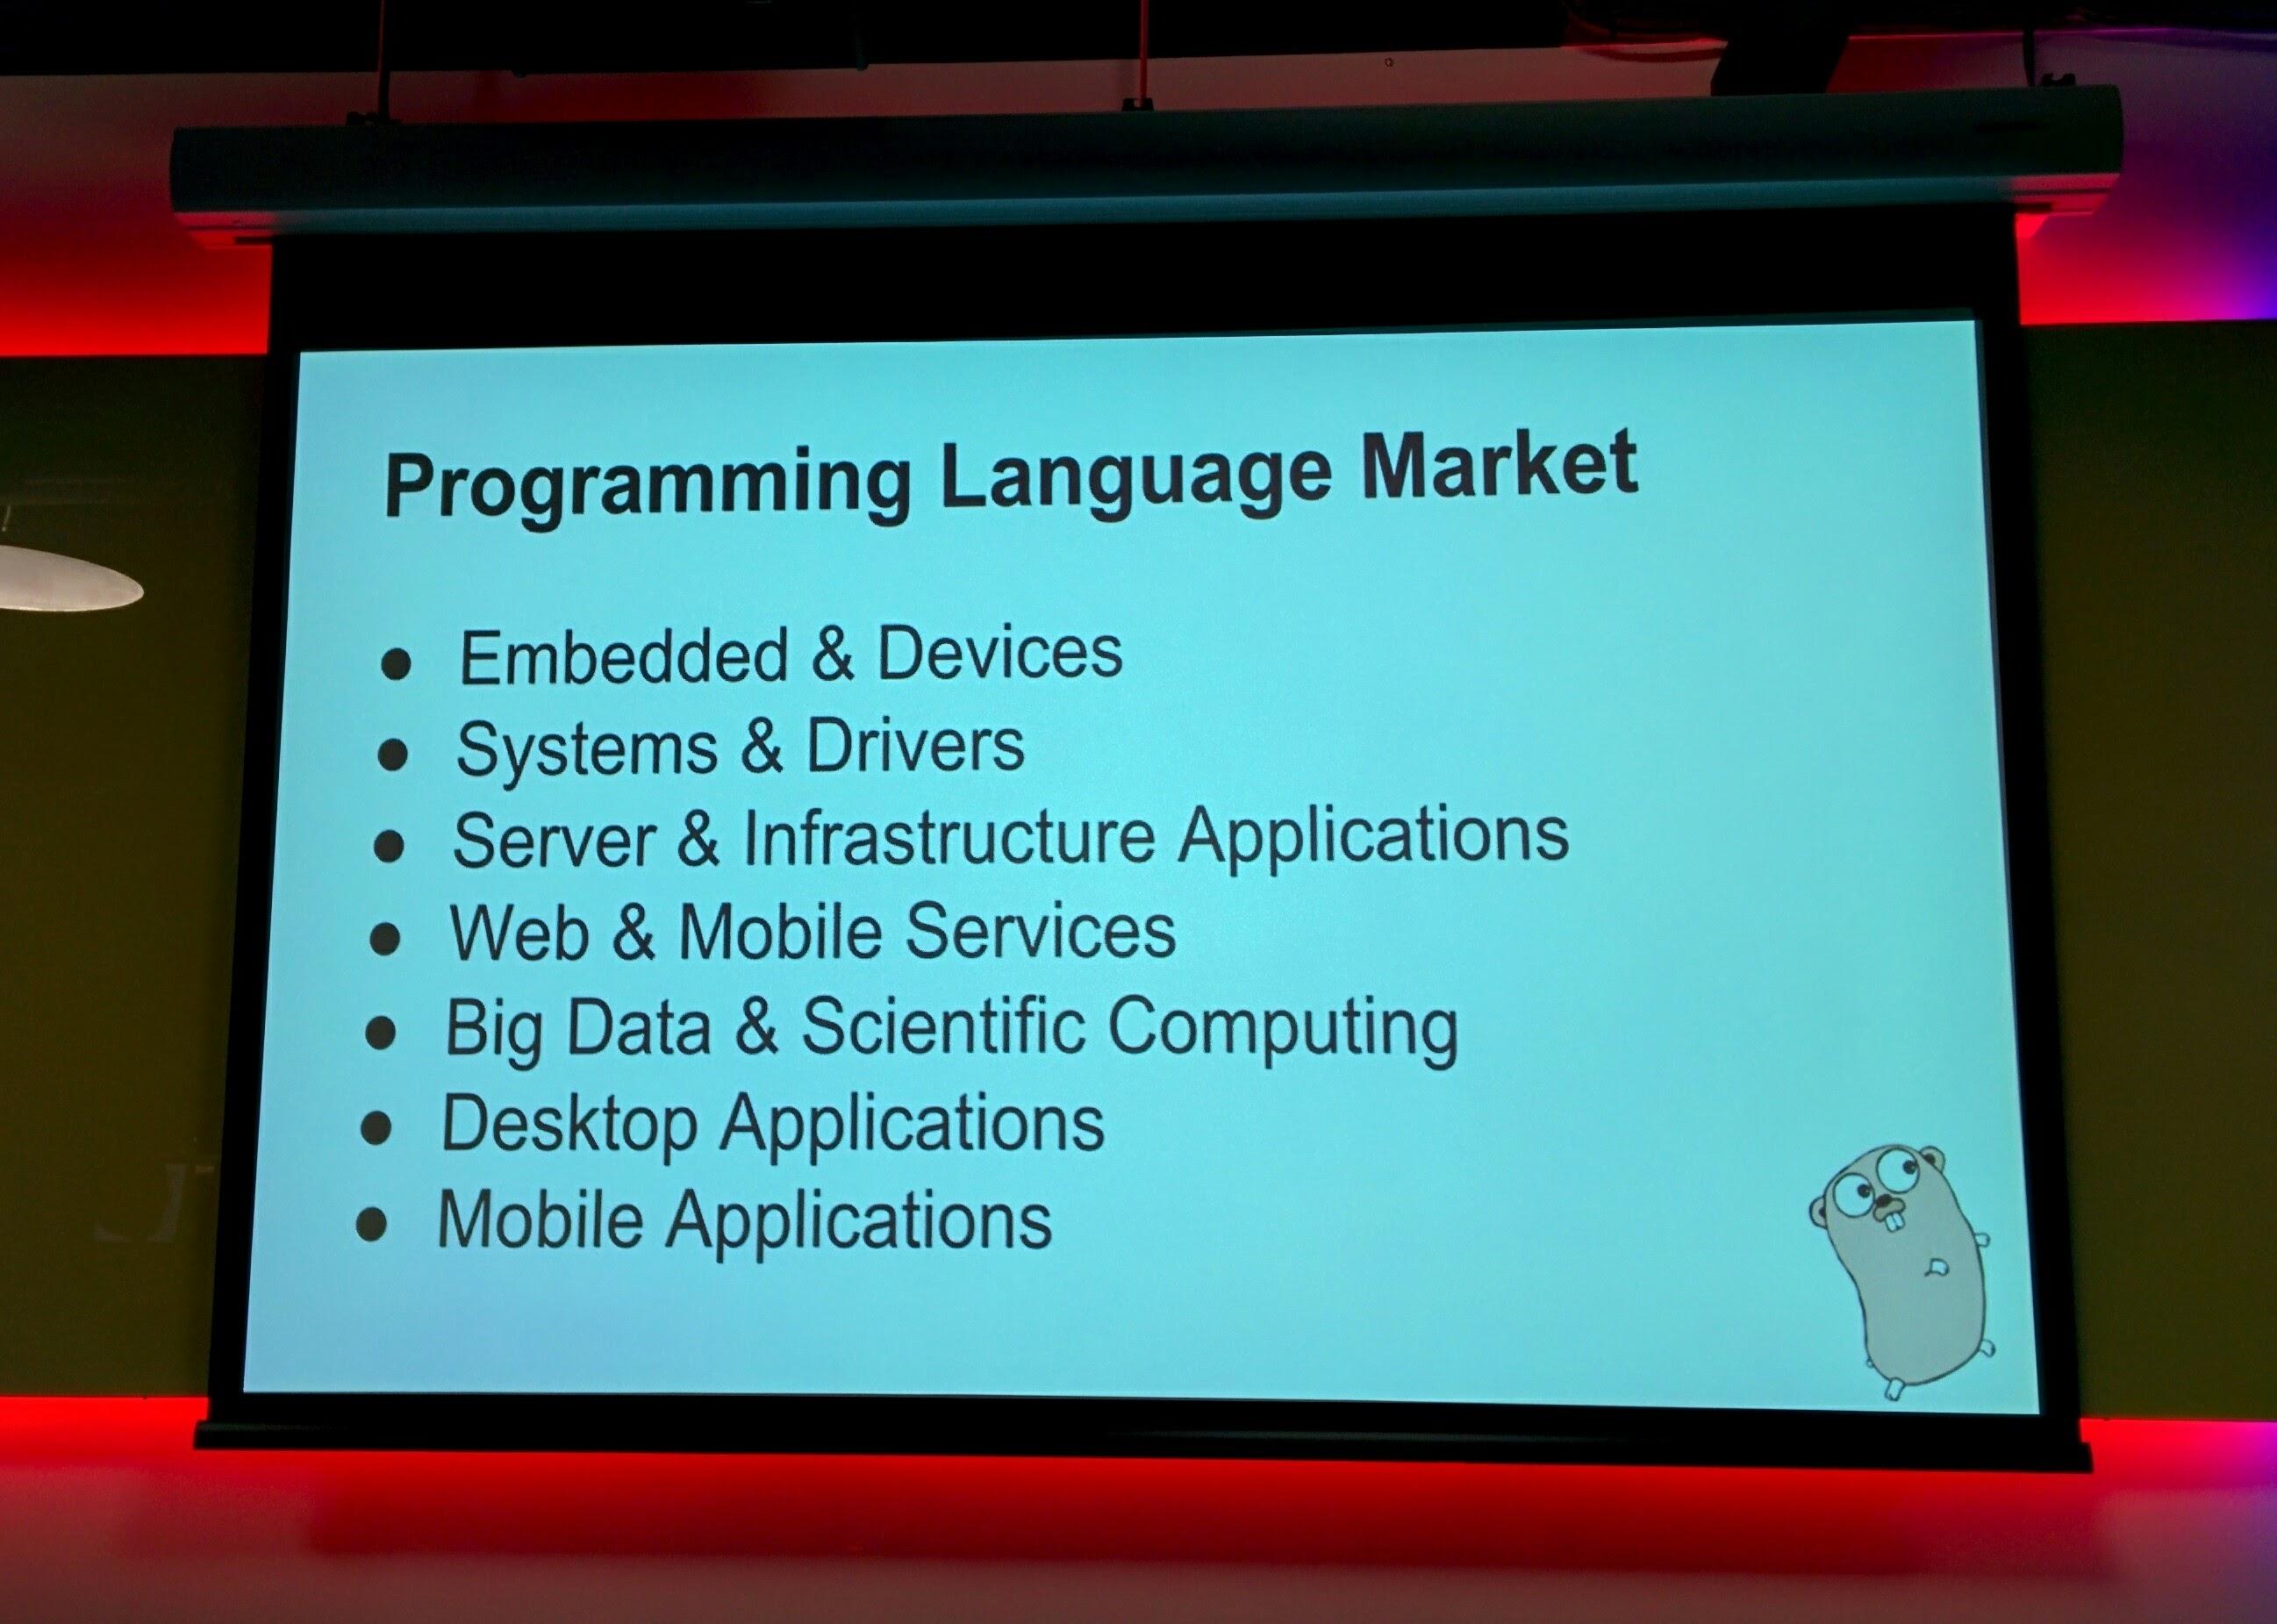 Programming Language market for Go, courtesy Jason Buberel